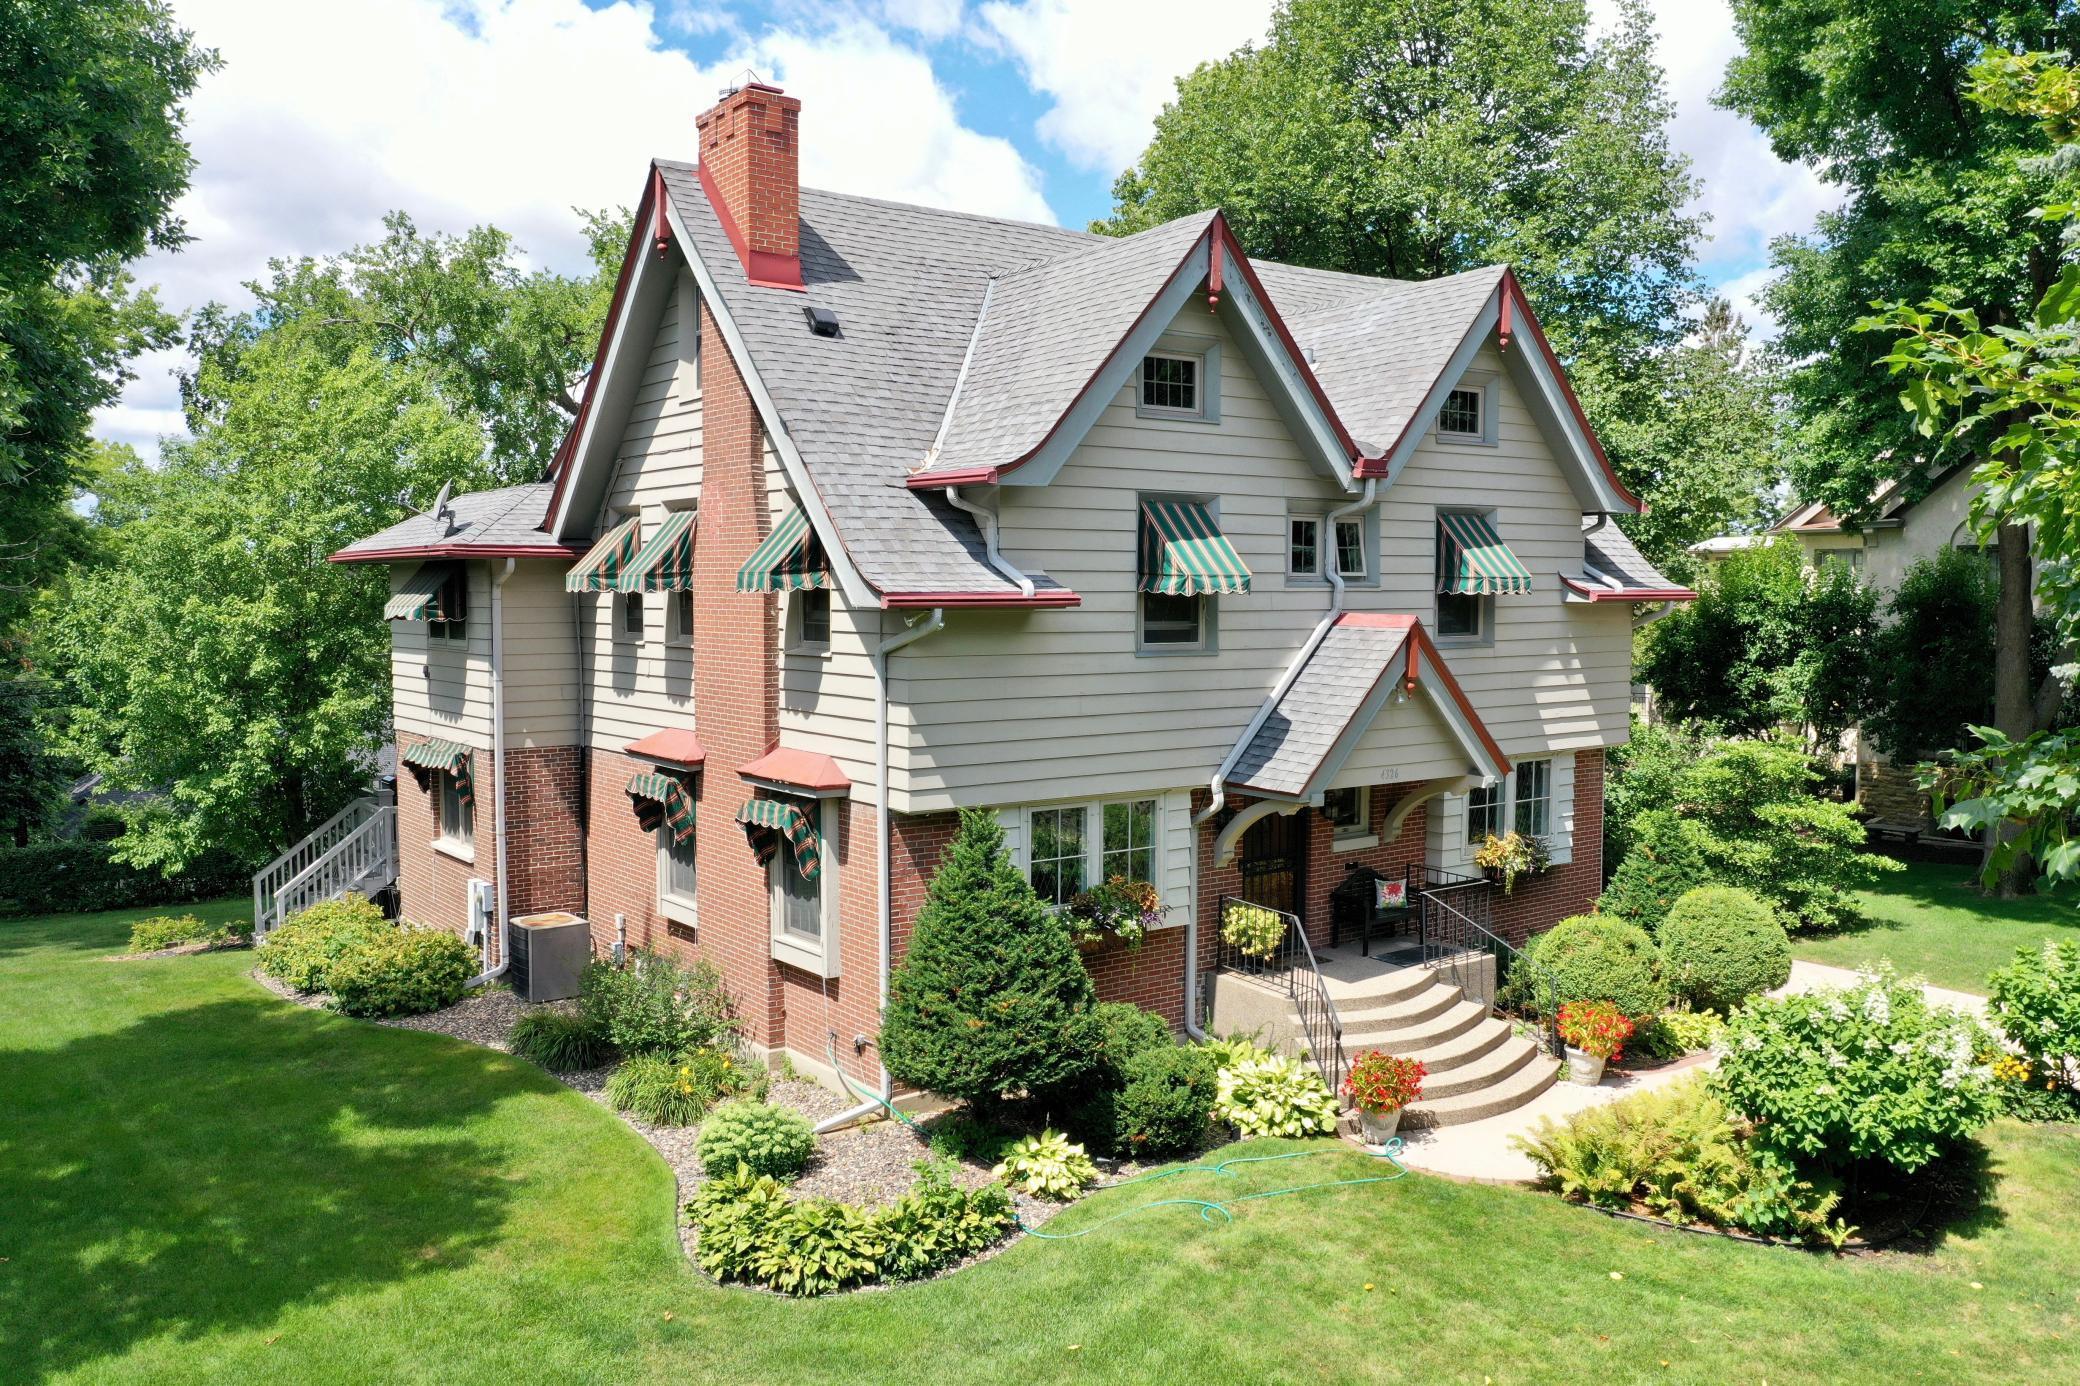 4326 Fremont S Property Photo - Minneapolis, MN real estate listing